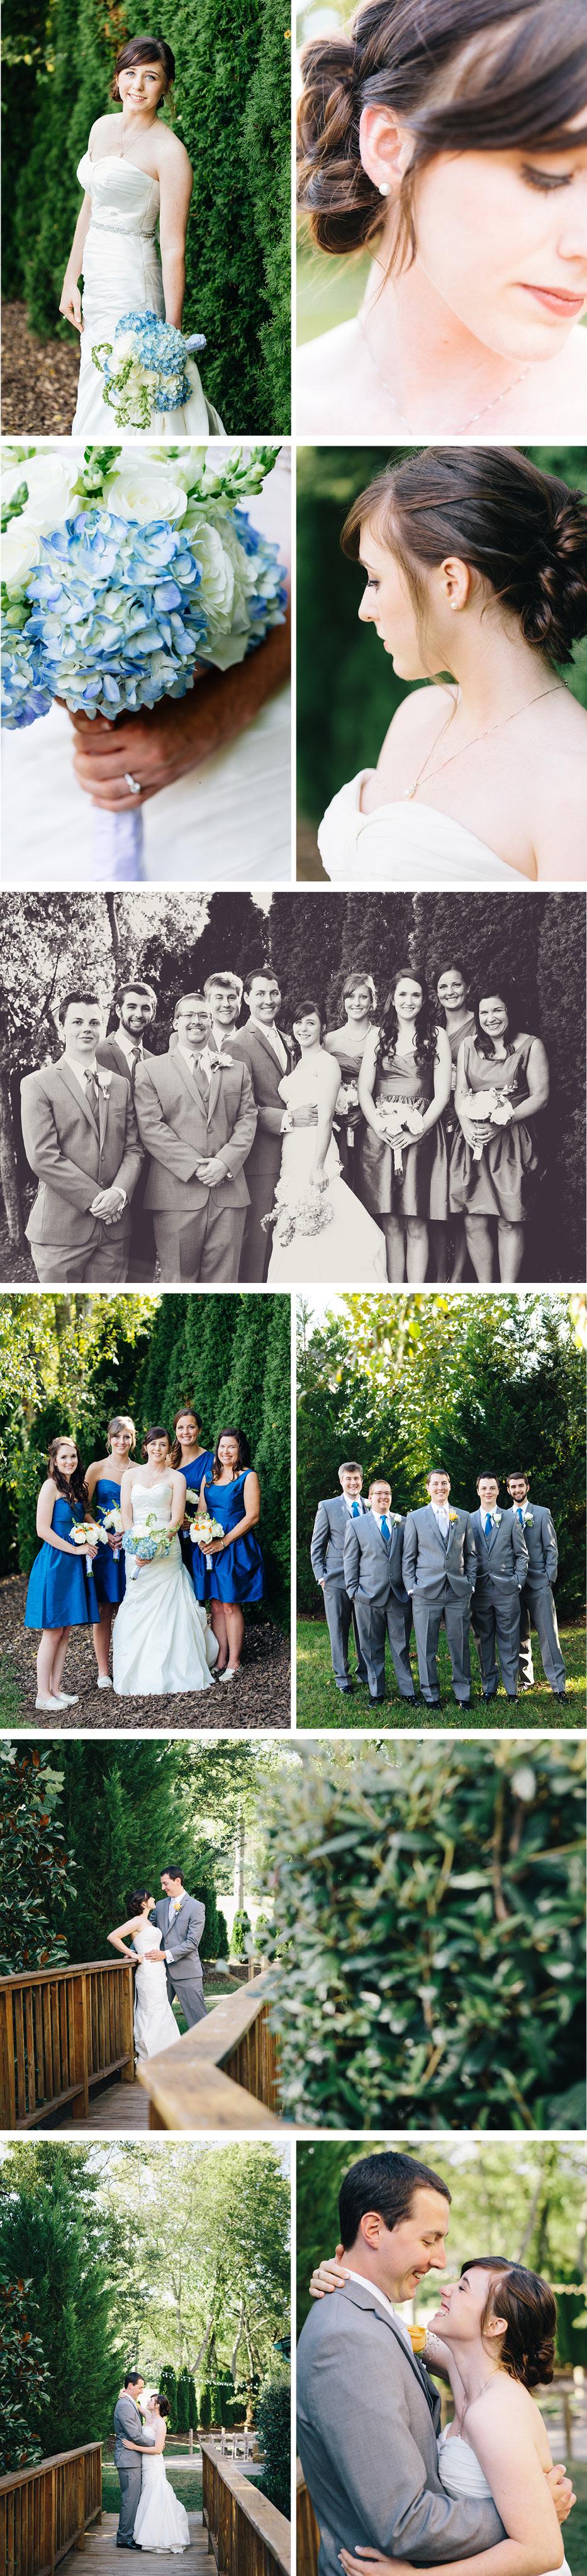 CK-Photo-Nashville-Wedding-Photographer-Brown4.jpg